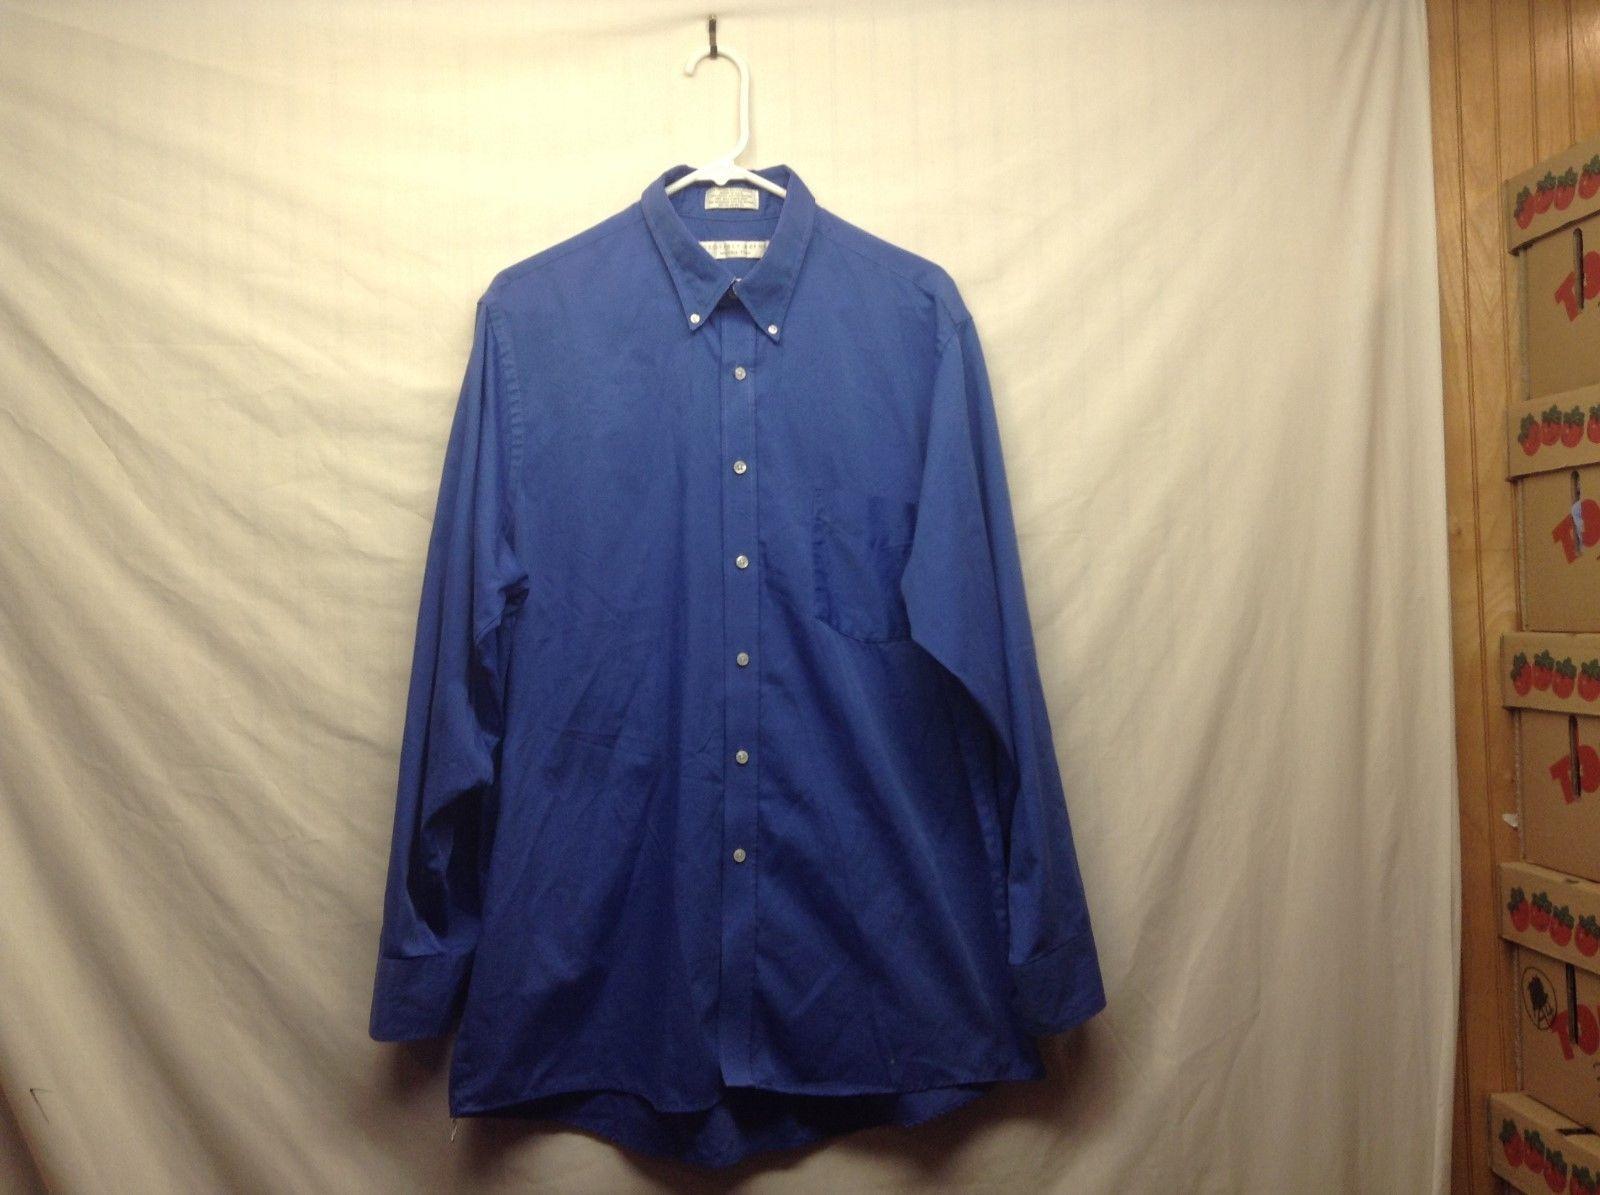 Geoffrey Beene Dark Blue Button Down Dress Shirt Sz 34/35 16.5